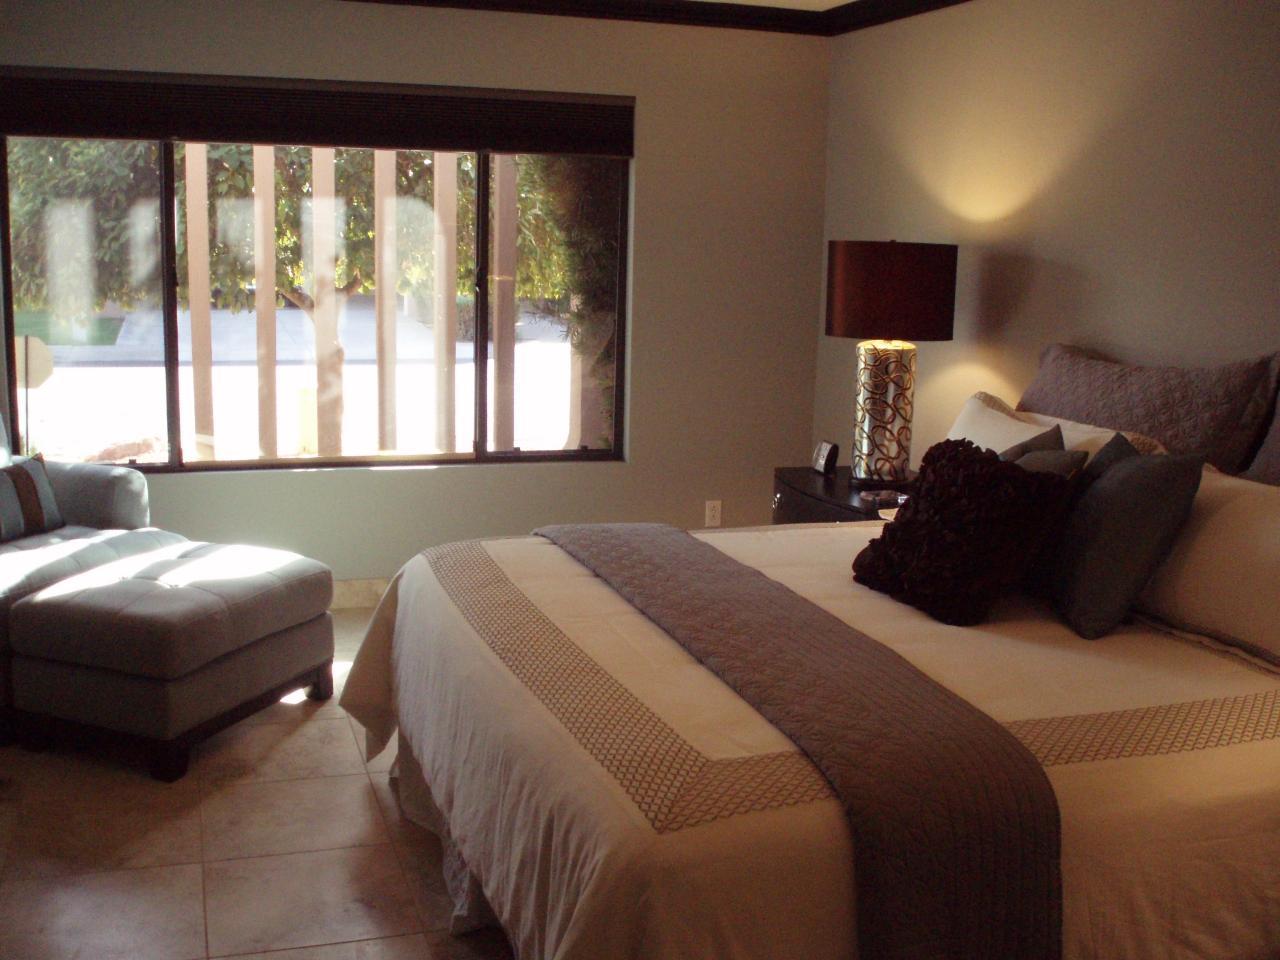 8674 E Via De Viva --, Scottsdale AZ 85258 - Photo 1